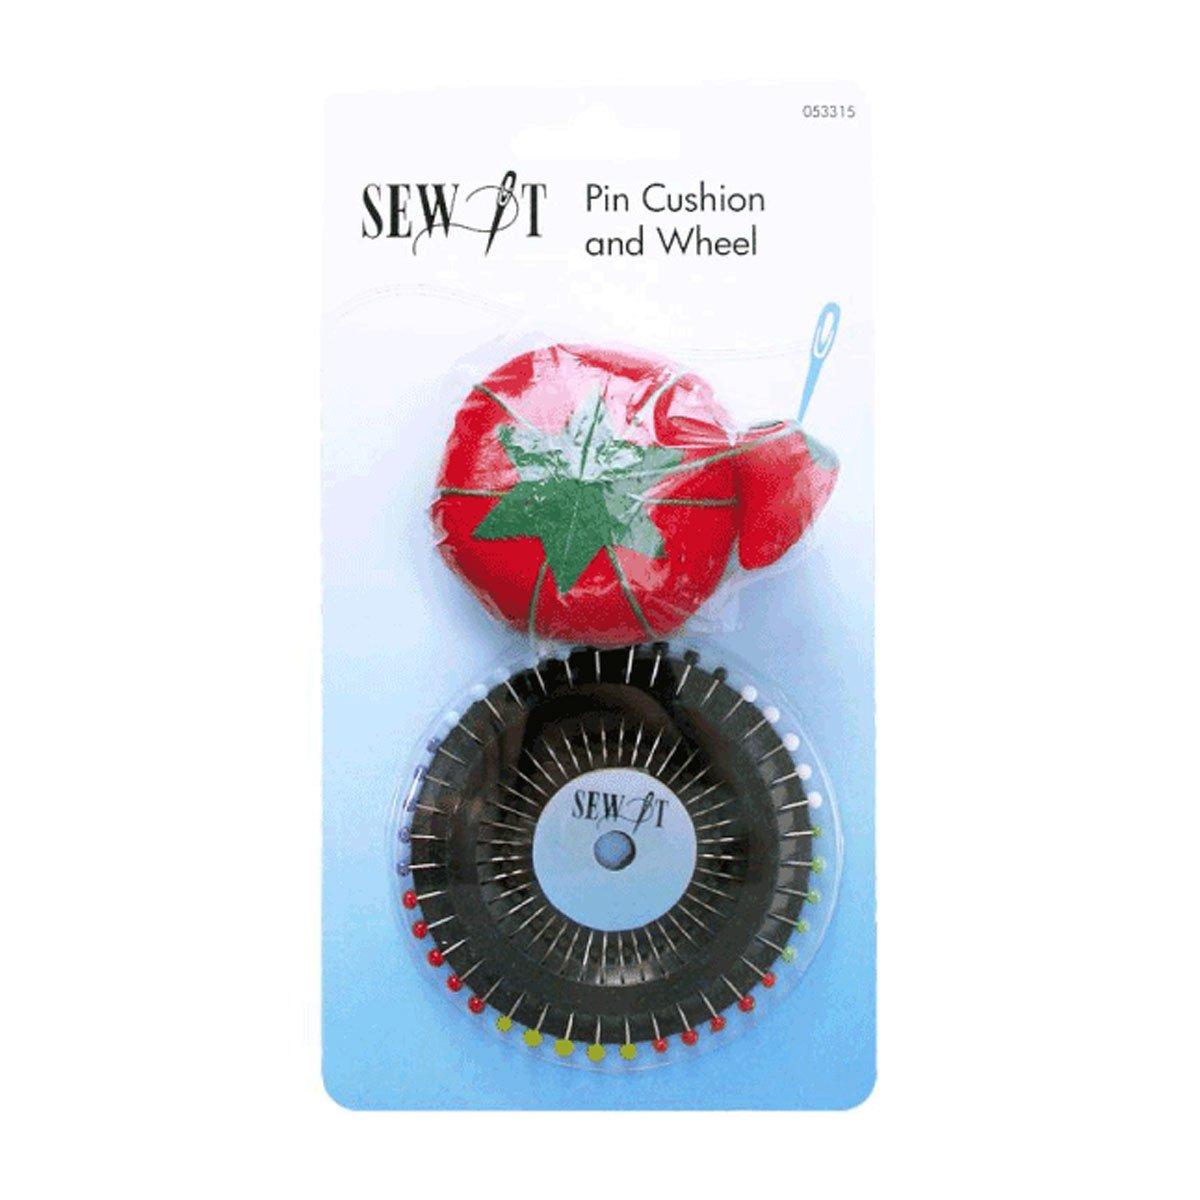 Se cose jitomate alfiletero con fresa afilador de rueda Abedul 053315